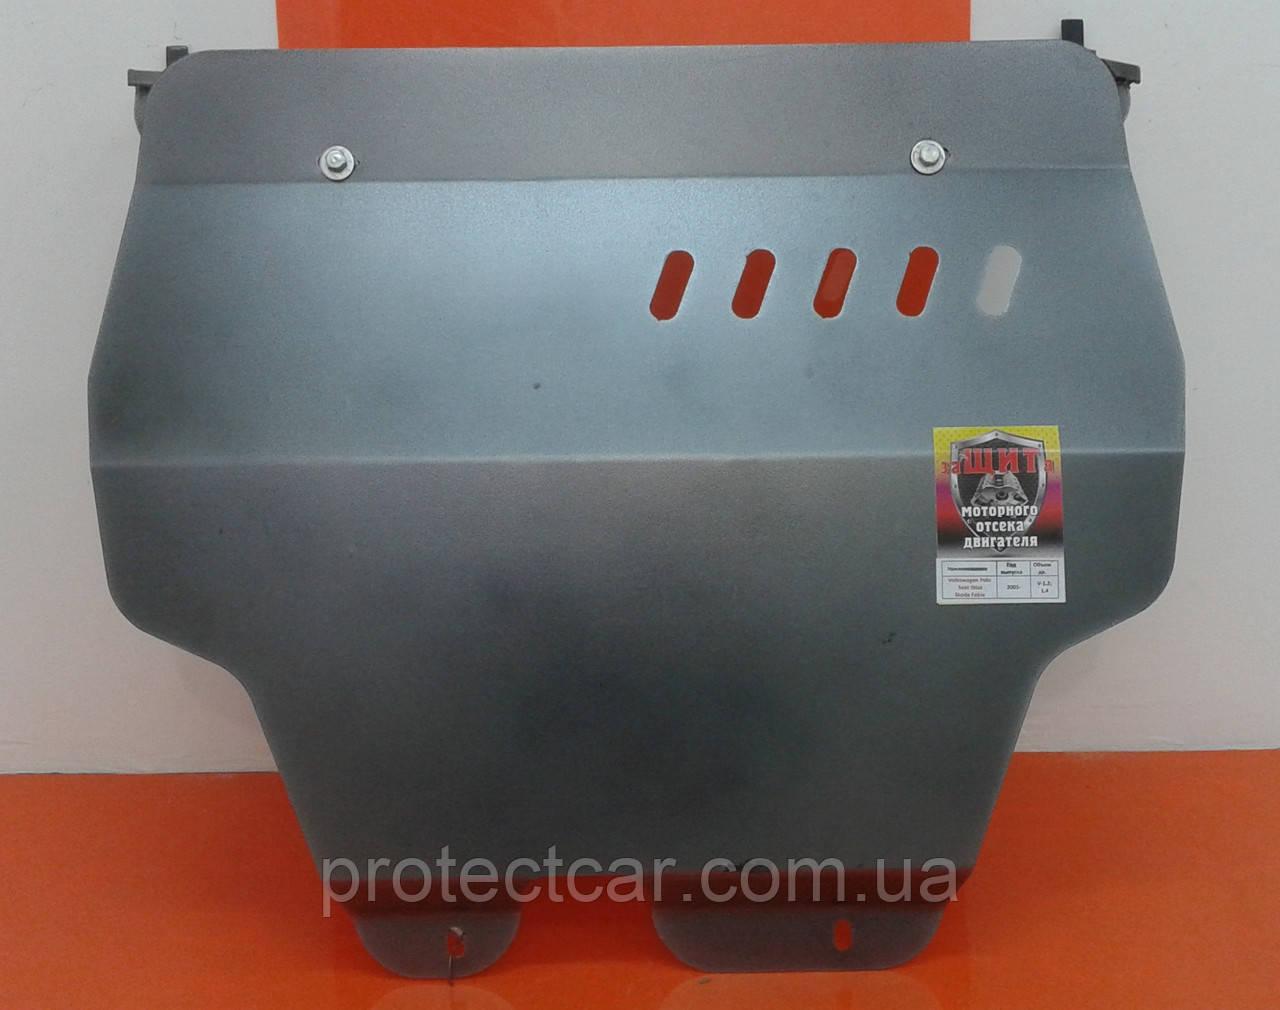 Защита двигателя VW POLO дизель